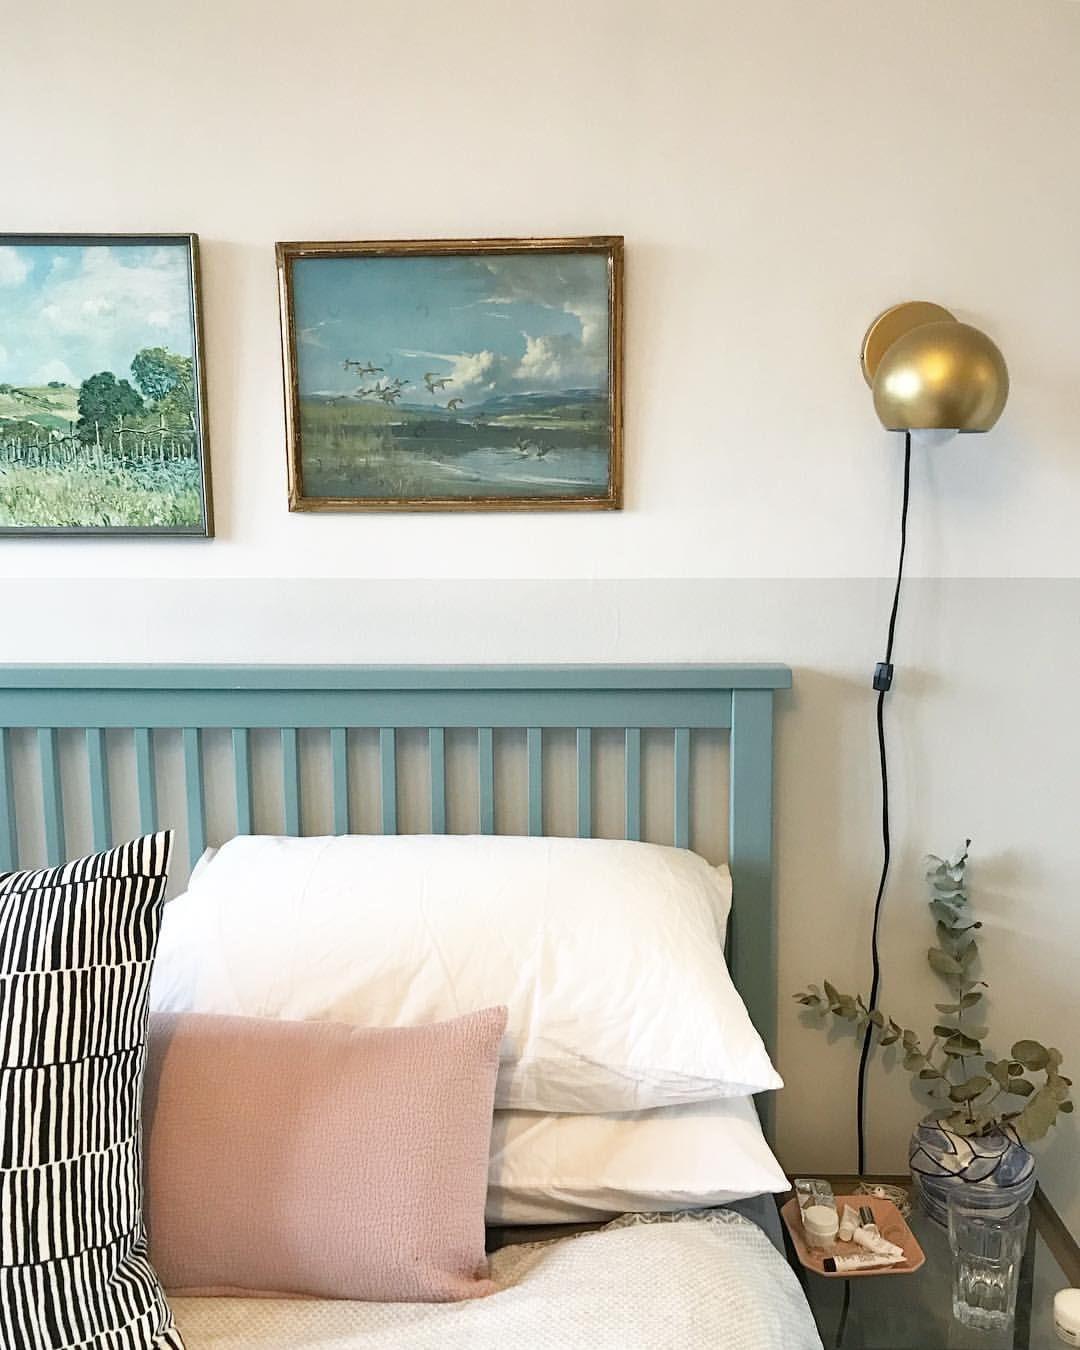 Wevet and Ammonite walls, Oval Room Blue headboard, art